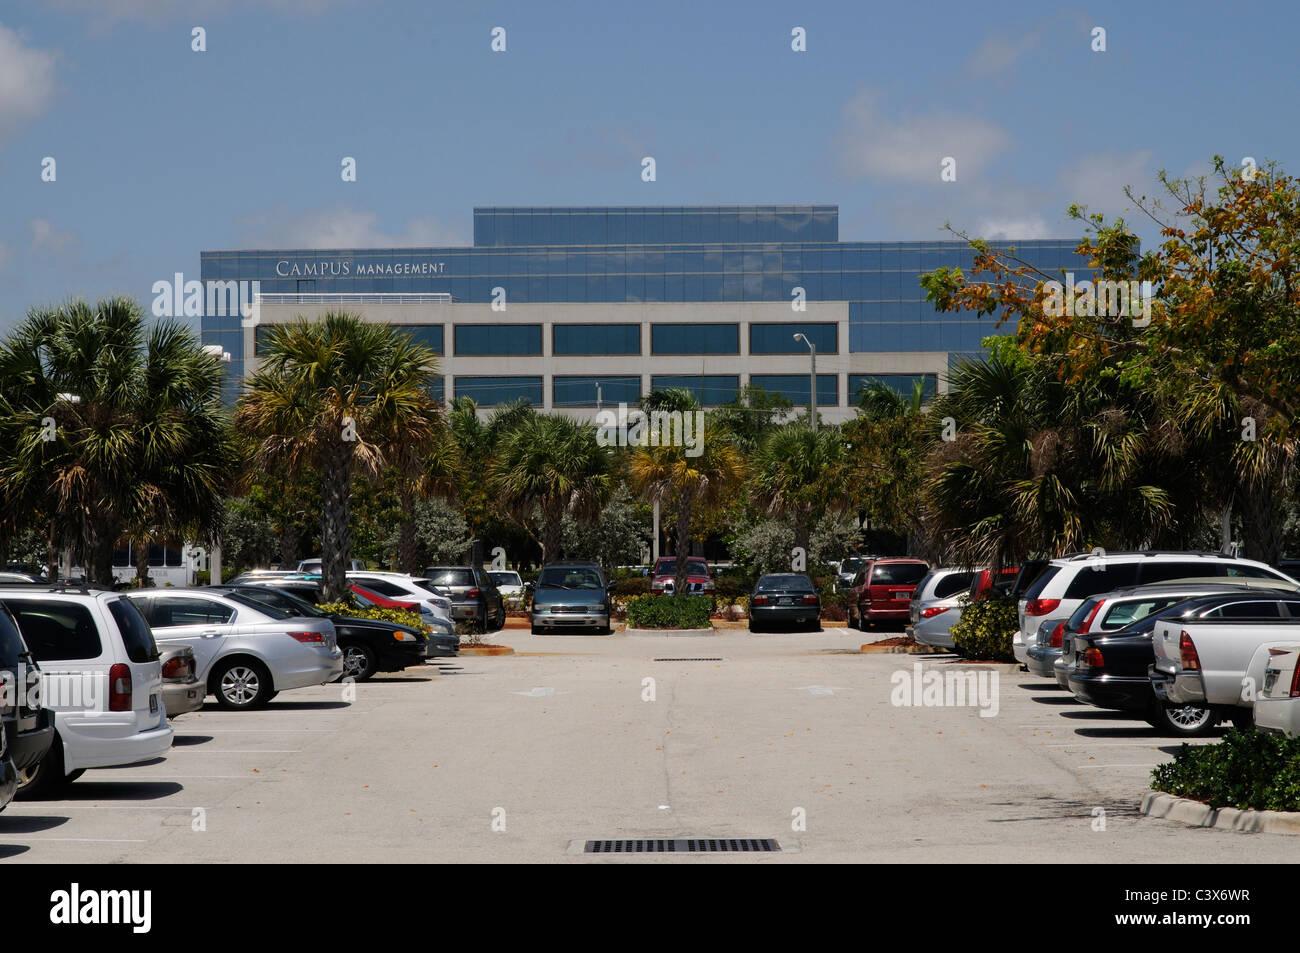 Campus Management Corporation building on Northwest 51st Street Boca Raton Florida USA - Stock Image